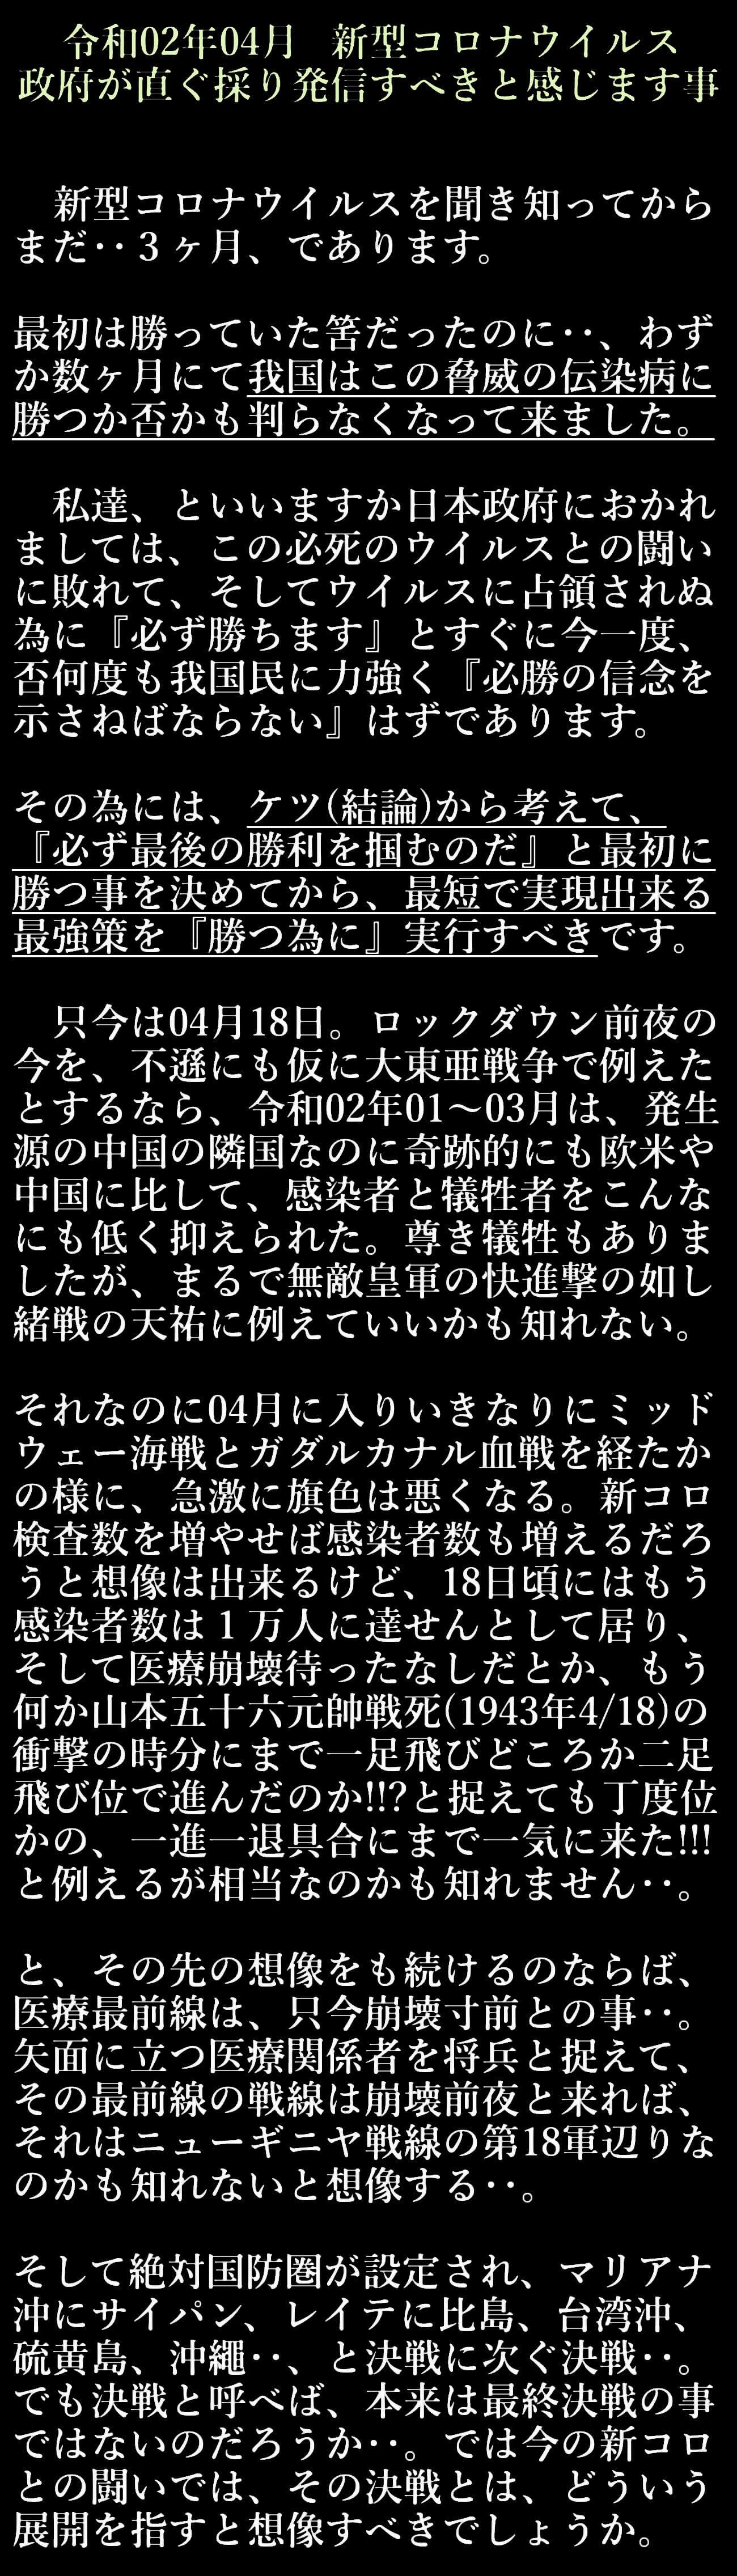 f:id:oomoroitakugoro:20200418174208a97j:plain